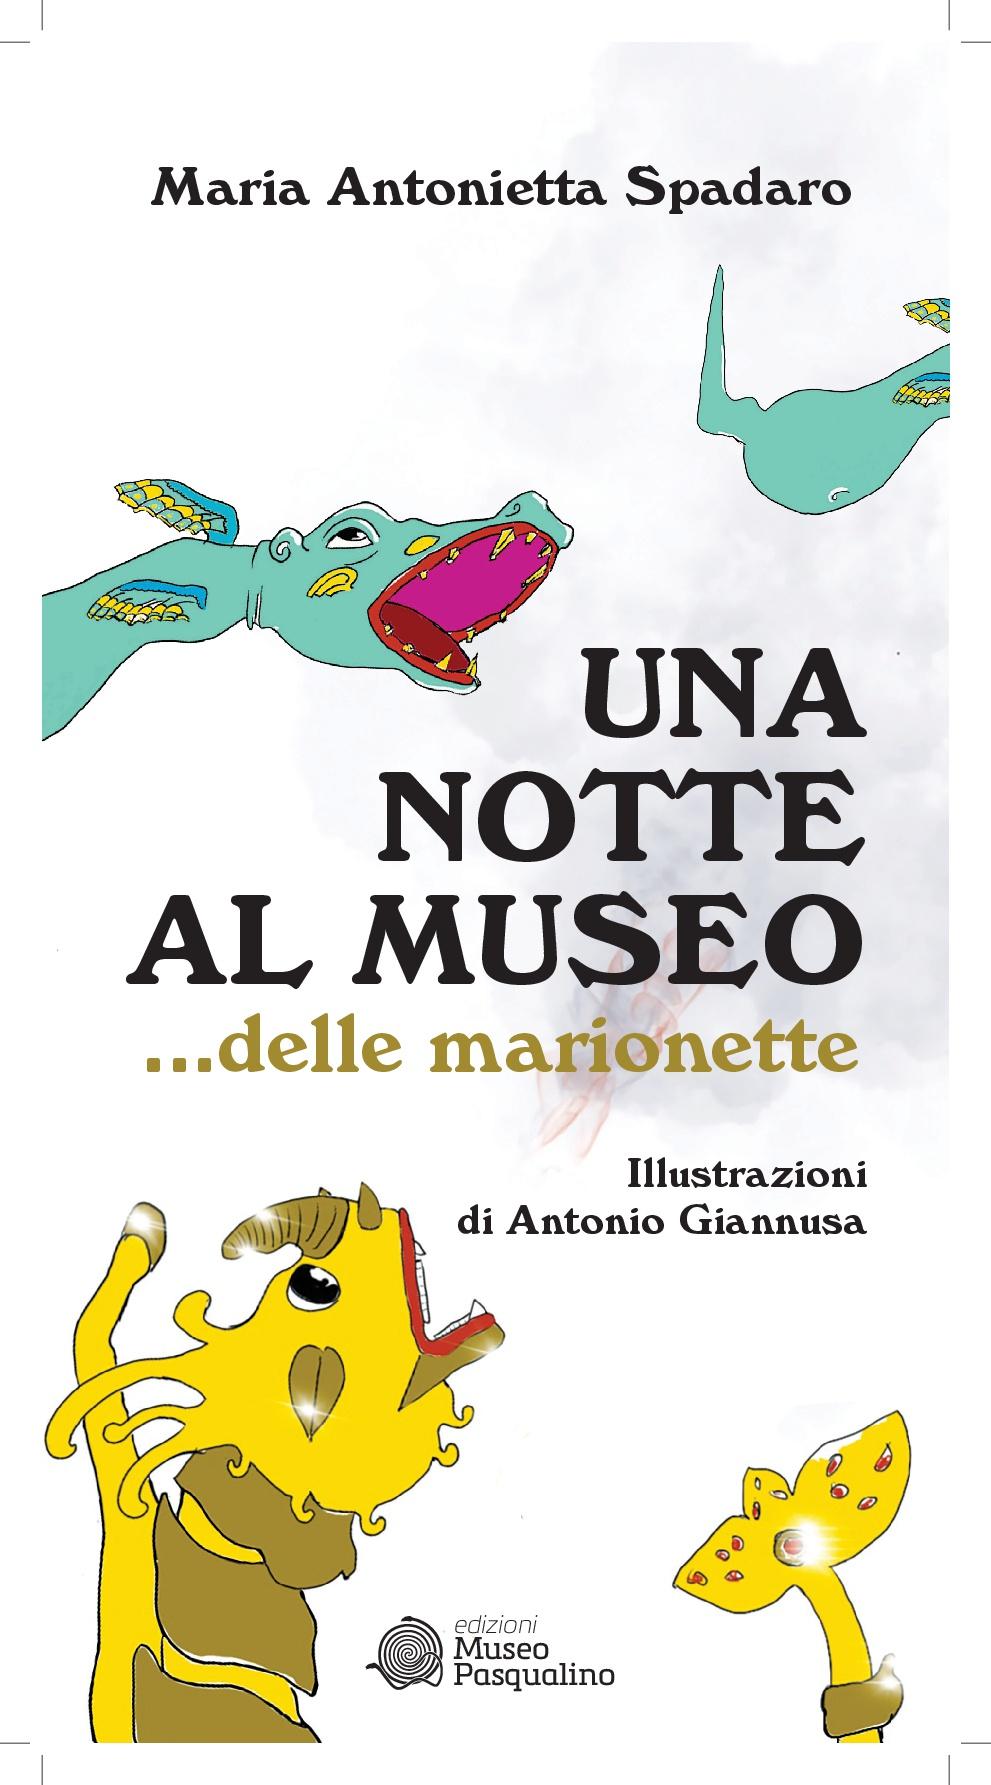 una_notte_al_museo-ultimo-001.jpg - 311.38 kB